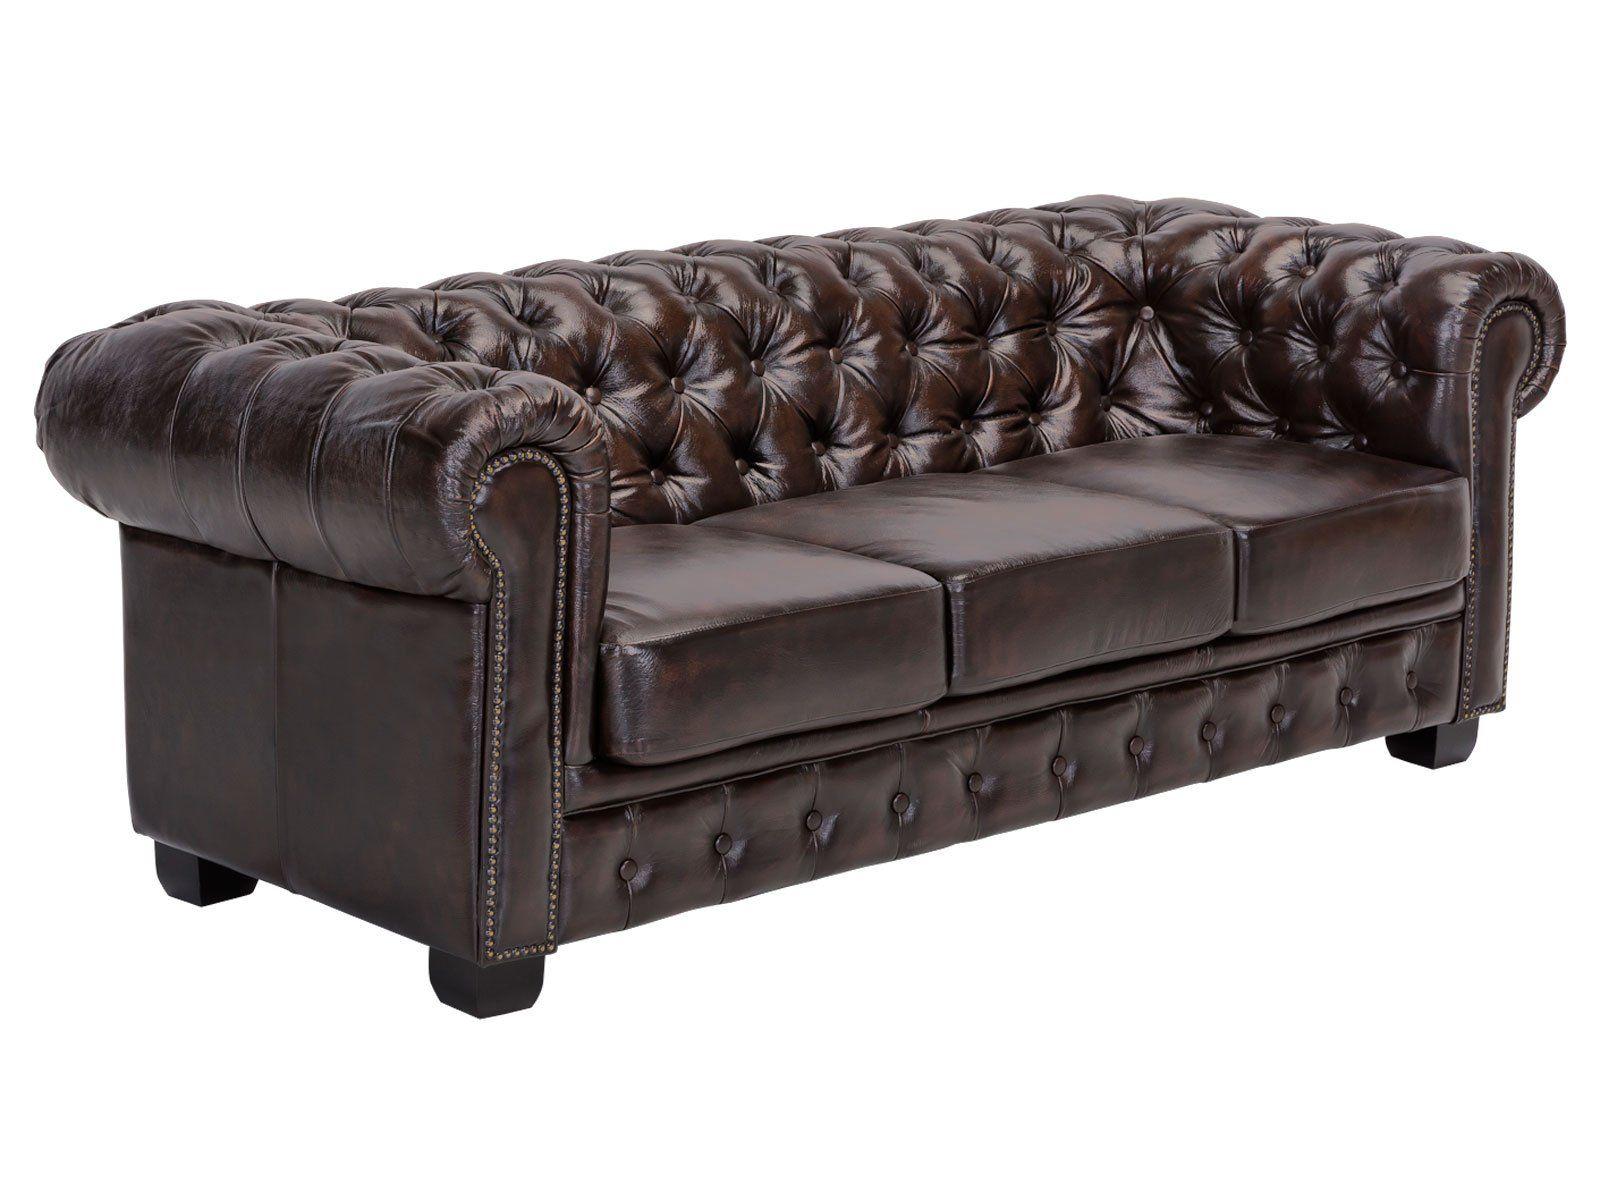 Woodkings C Chesterfield Sofa 3 Sitzer Braun Vintage Echtleder Couch B Rosofa Polsterm Bel 3 Sitzer Antik Designsofa Federke In 2020 Chesterfield Chair Decor